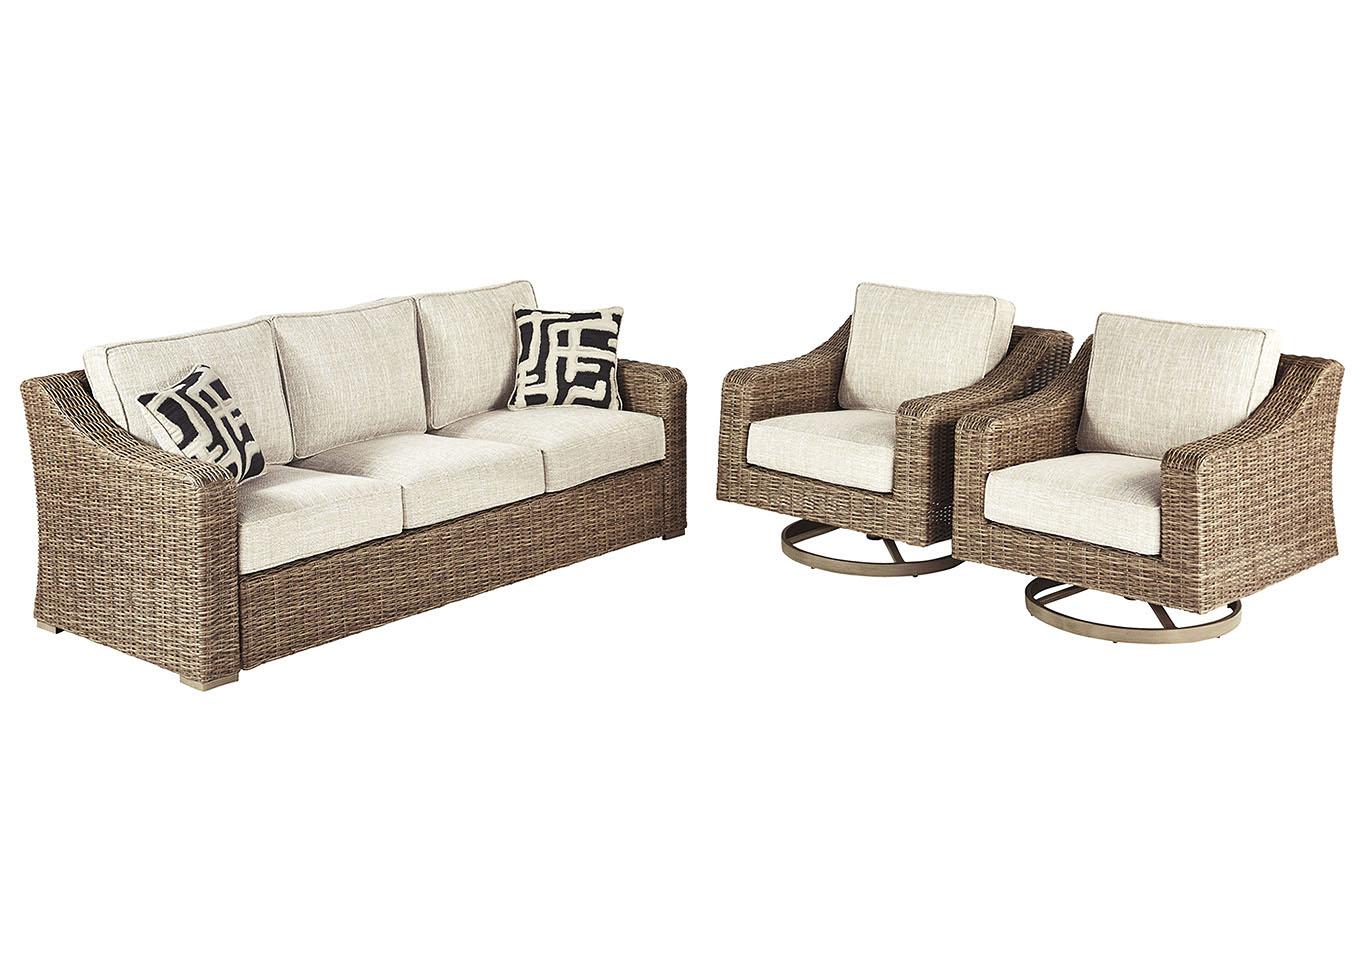 beachcroft beige sofa w 2 swivel chairs best buy furniture and mattress